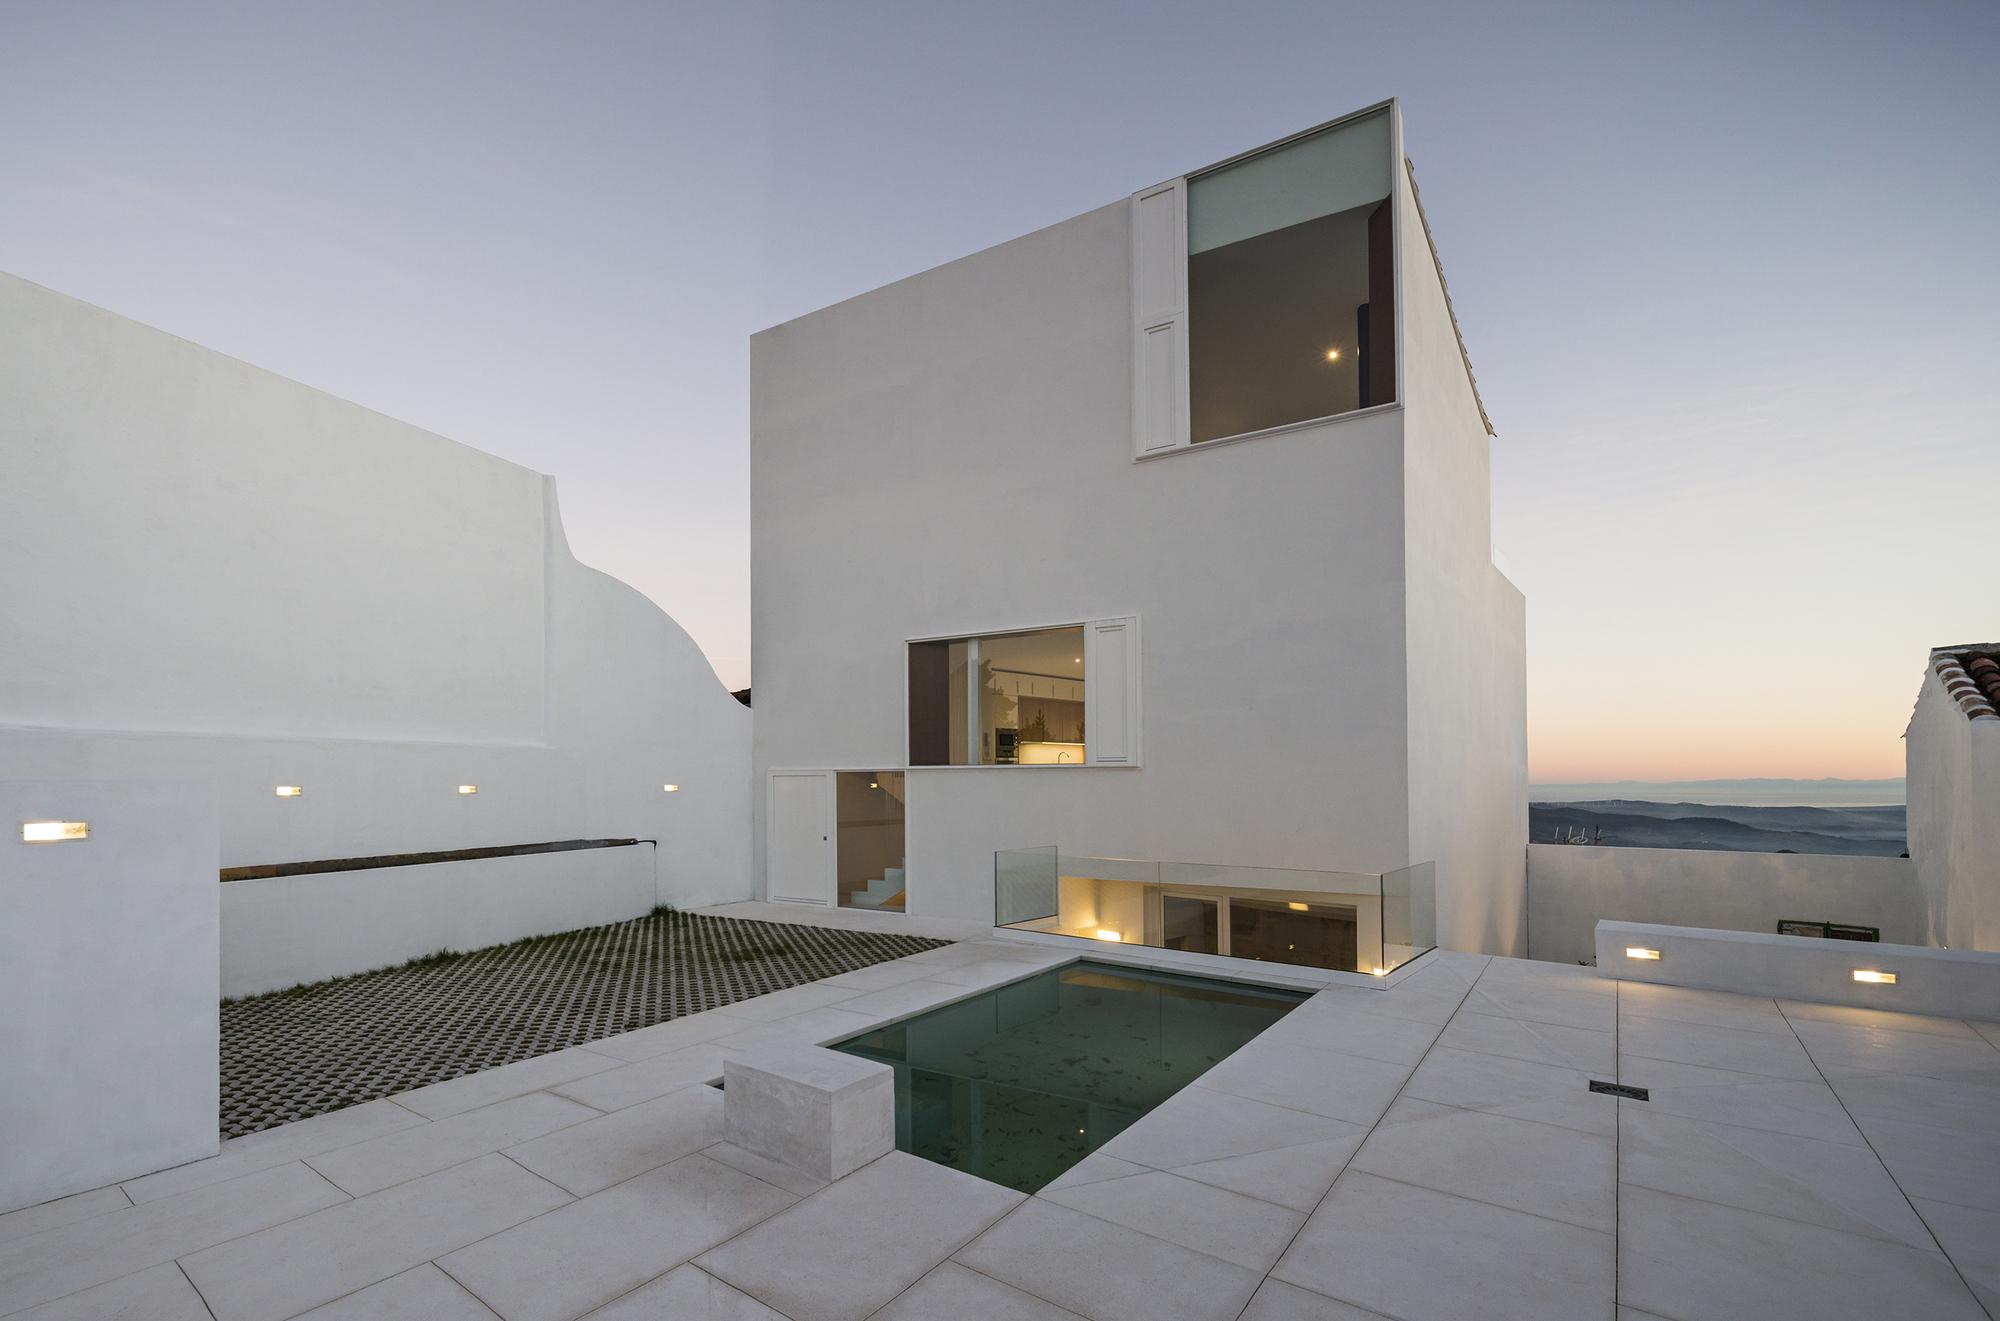 galeria de casa claire dtr studio architects 9. Black Bedroom Furniture Sets. Home Design Ideas